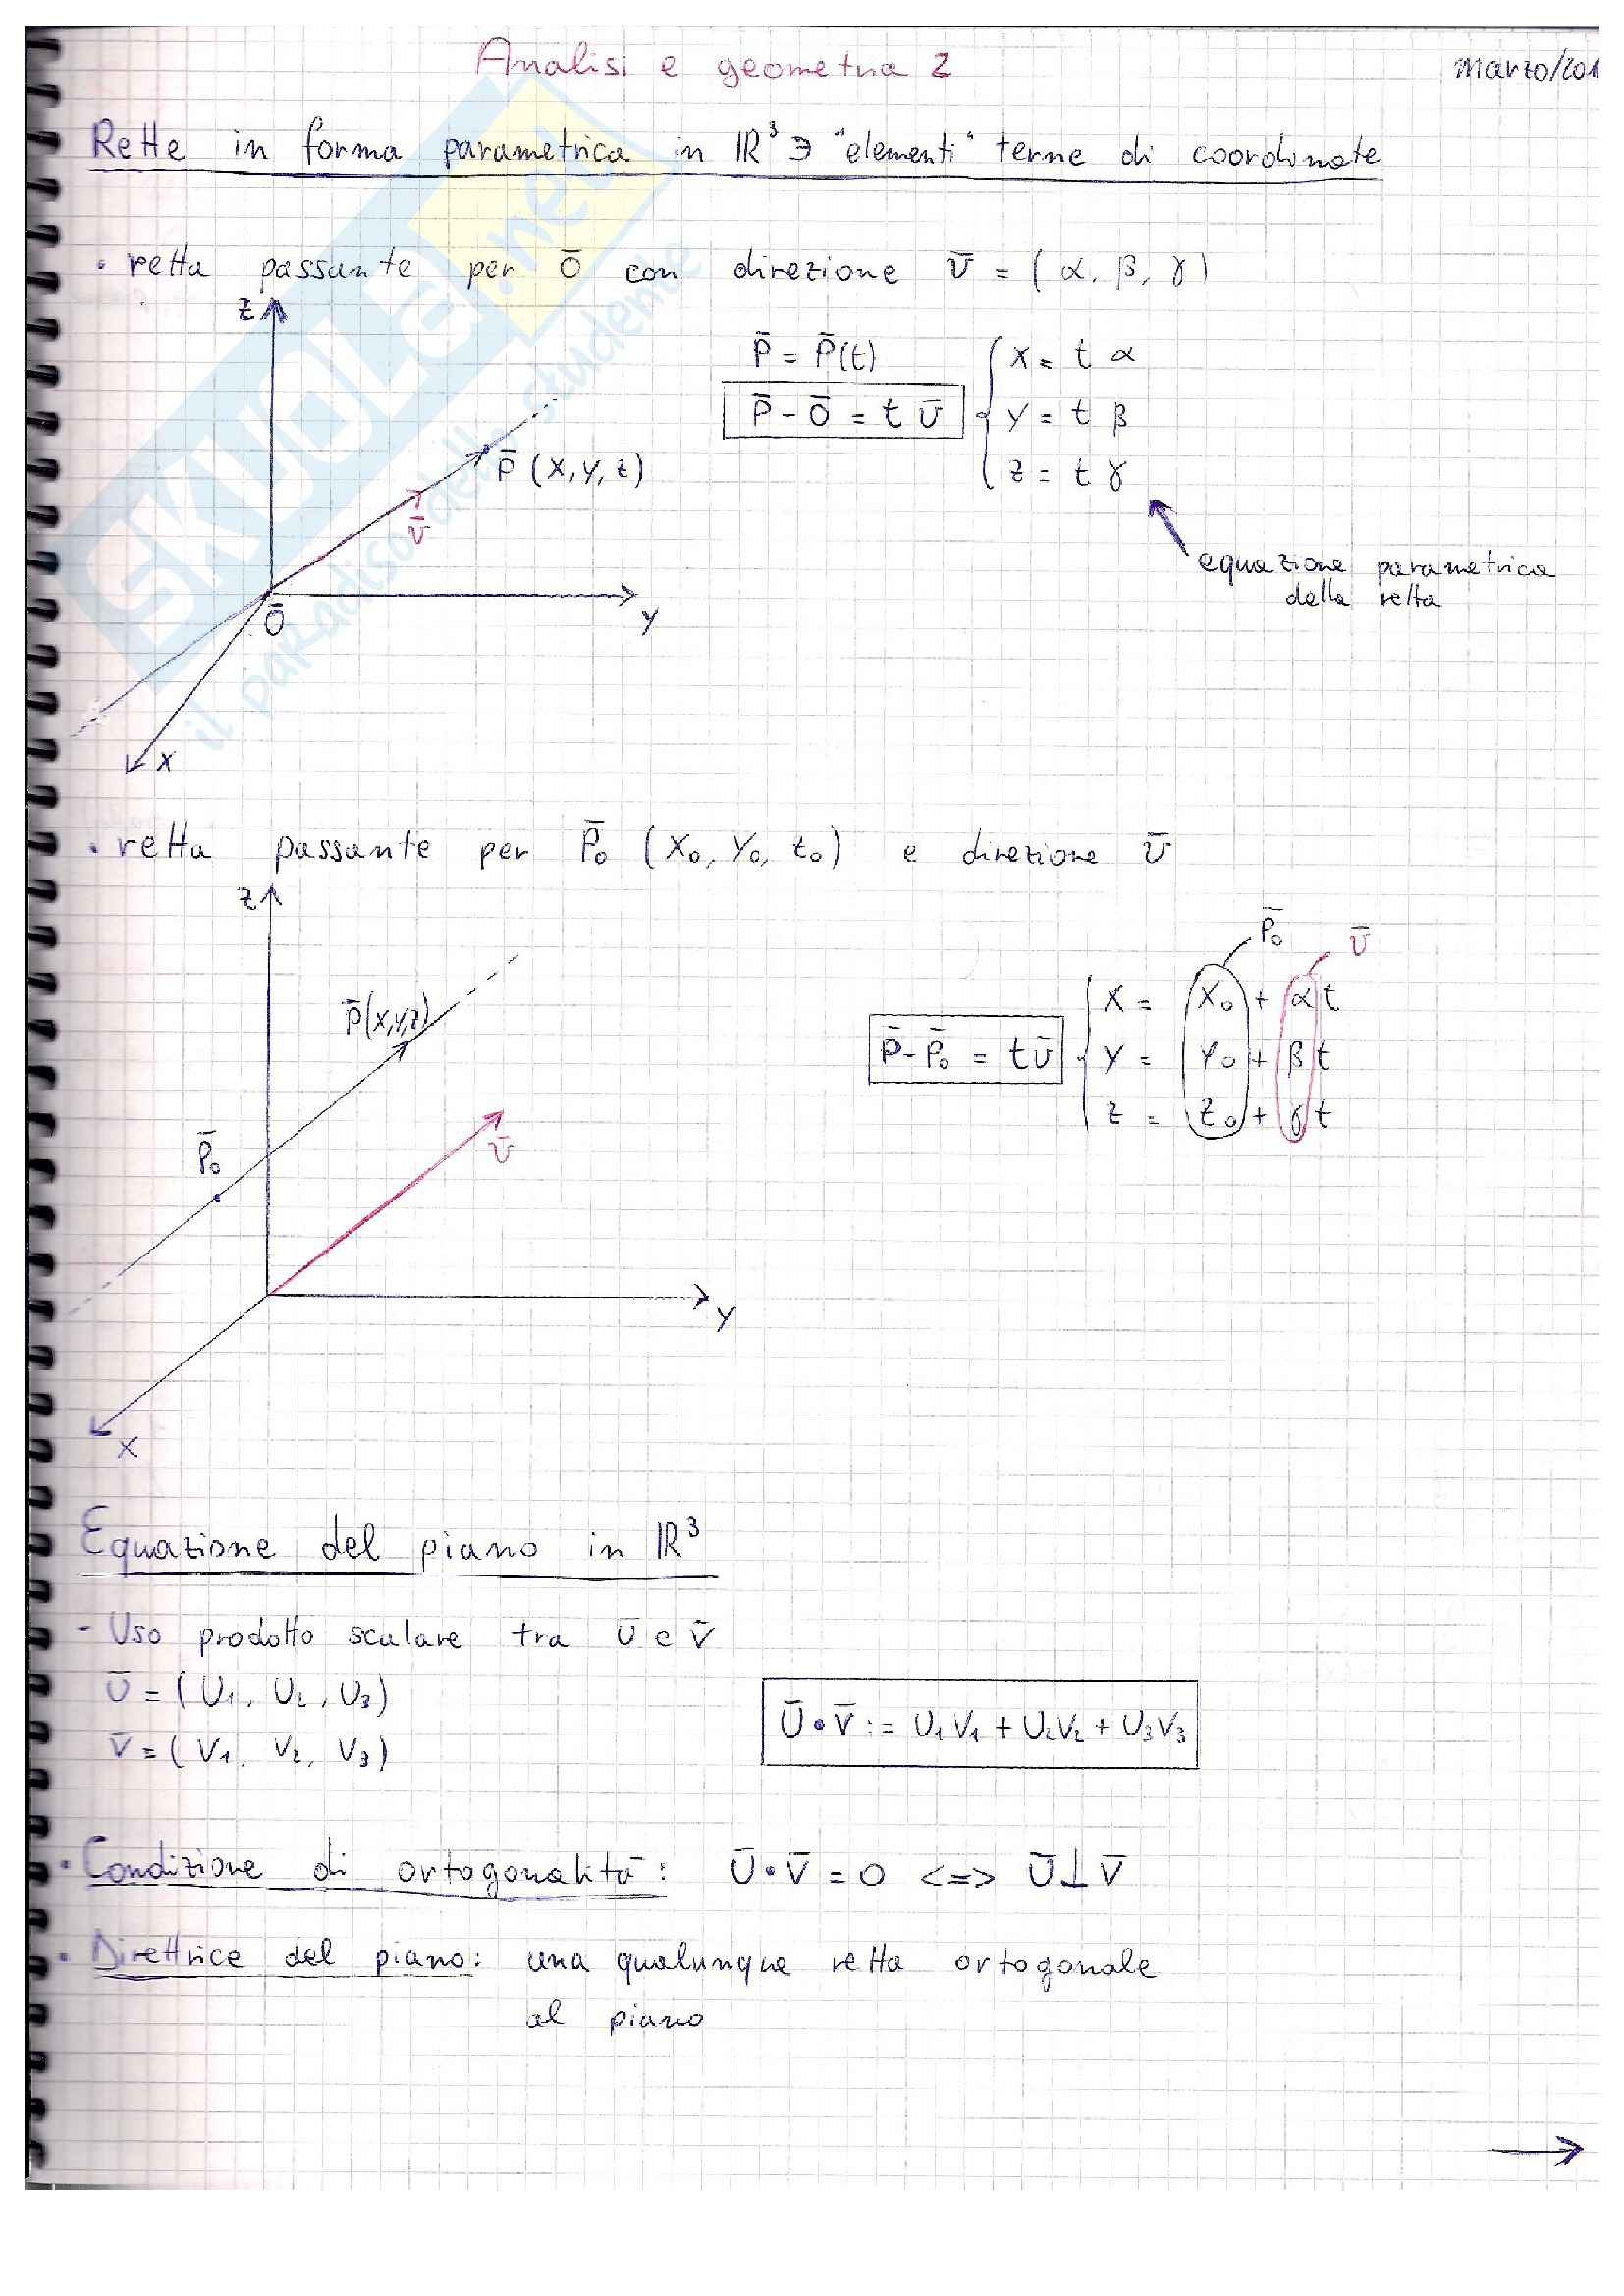 appunto F. Vegni Analisi e geometria 2